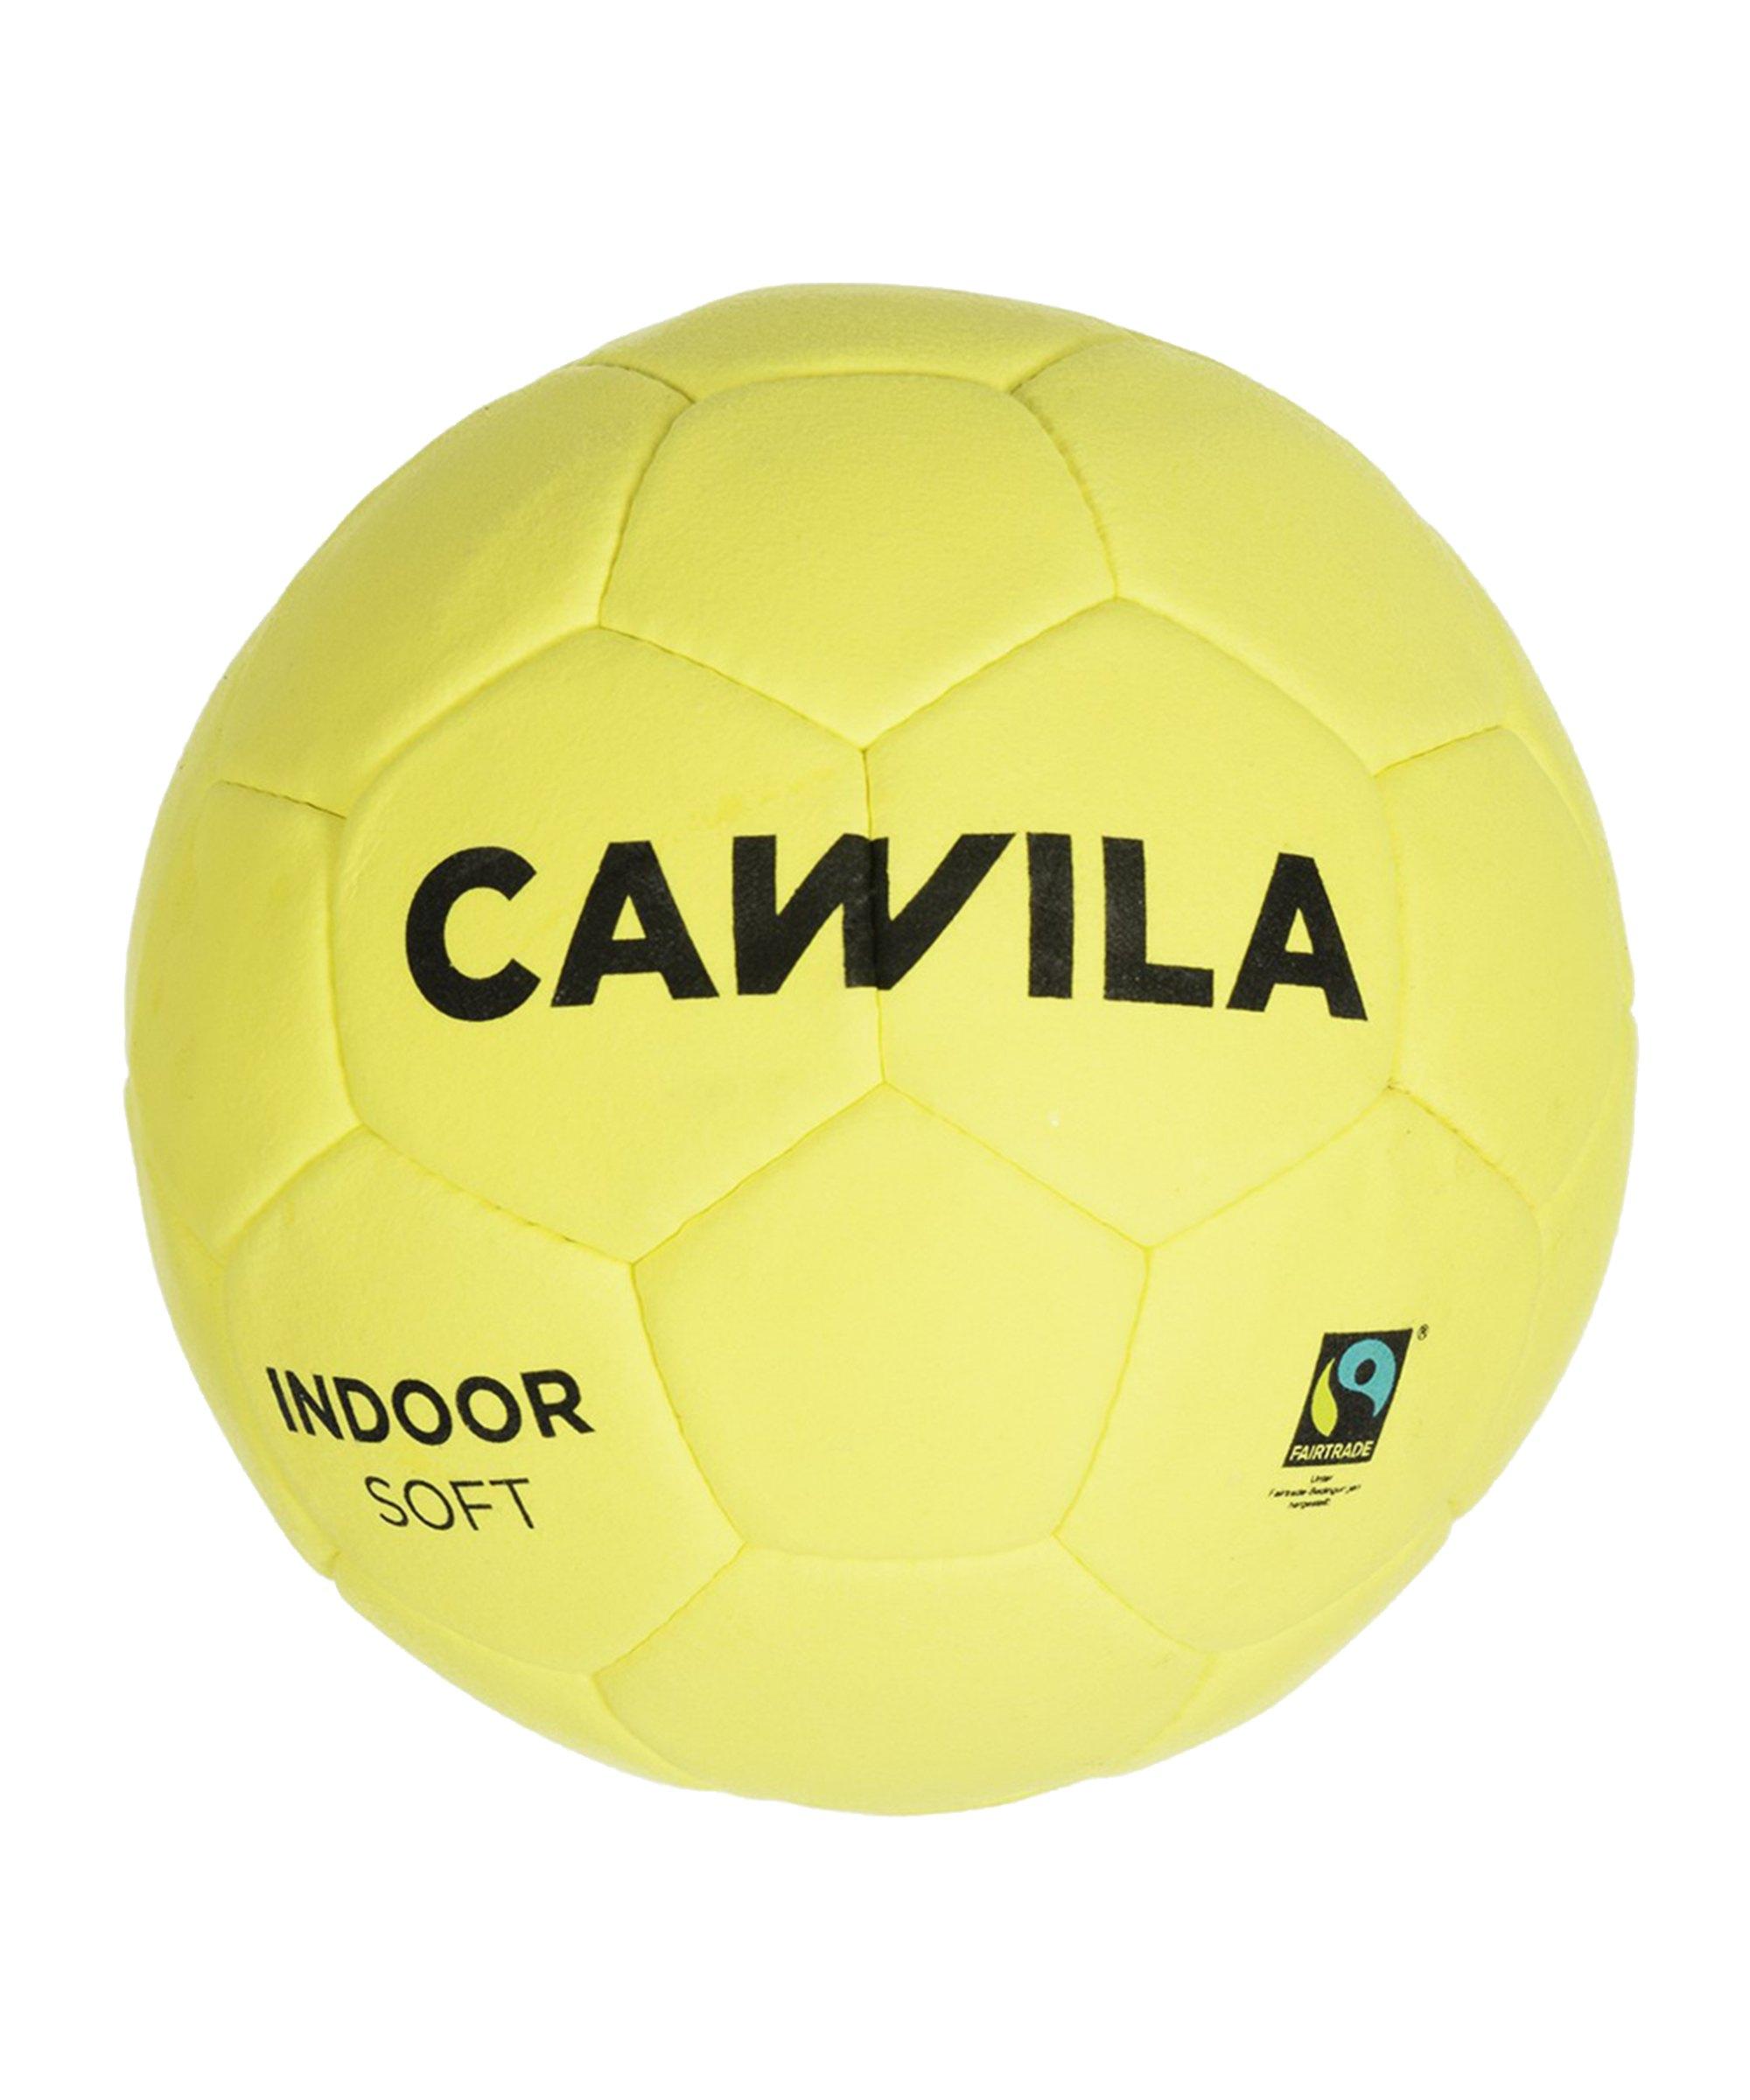 Cawila Fussball Indoor Soft 5 Gelb - gelb